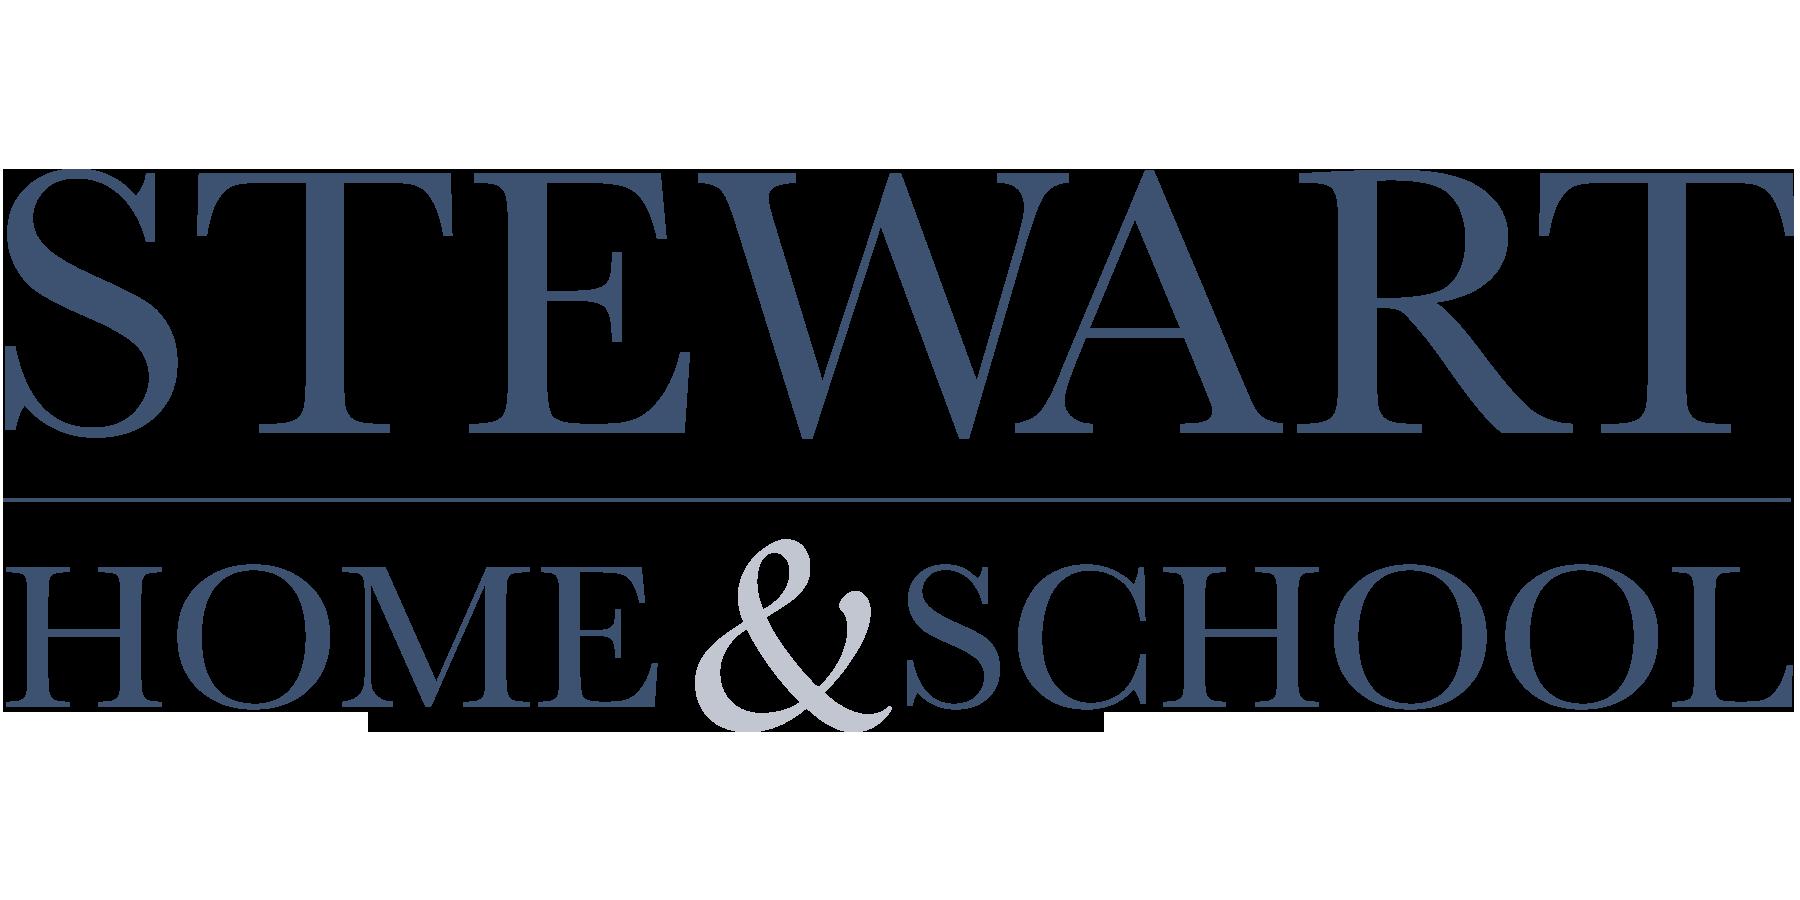 media/2017 StewartHome logo.png